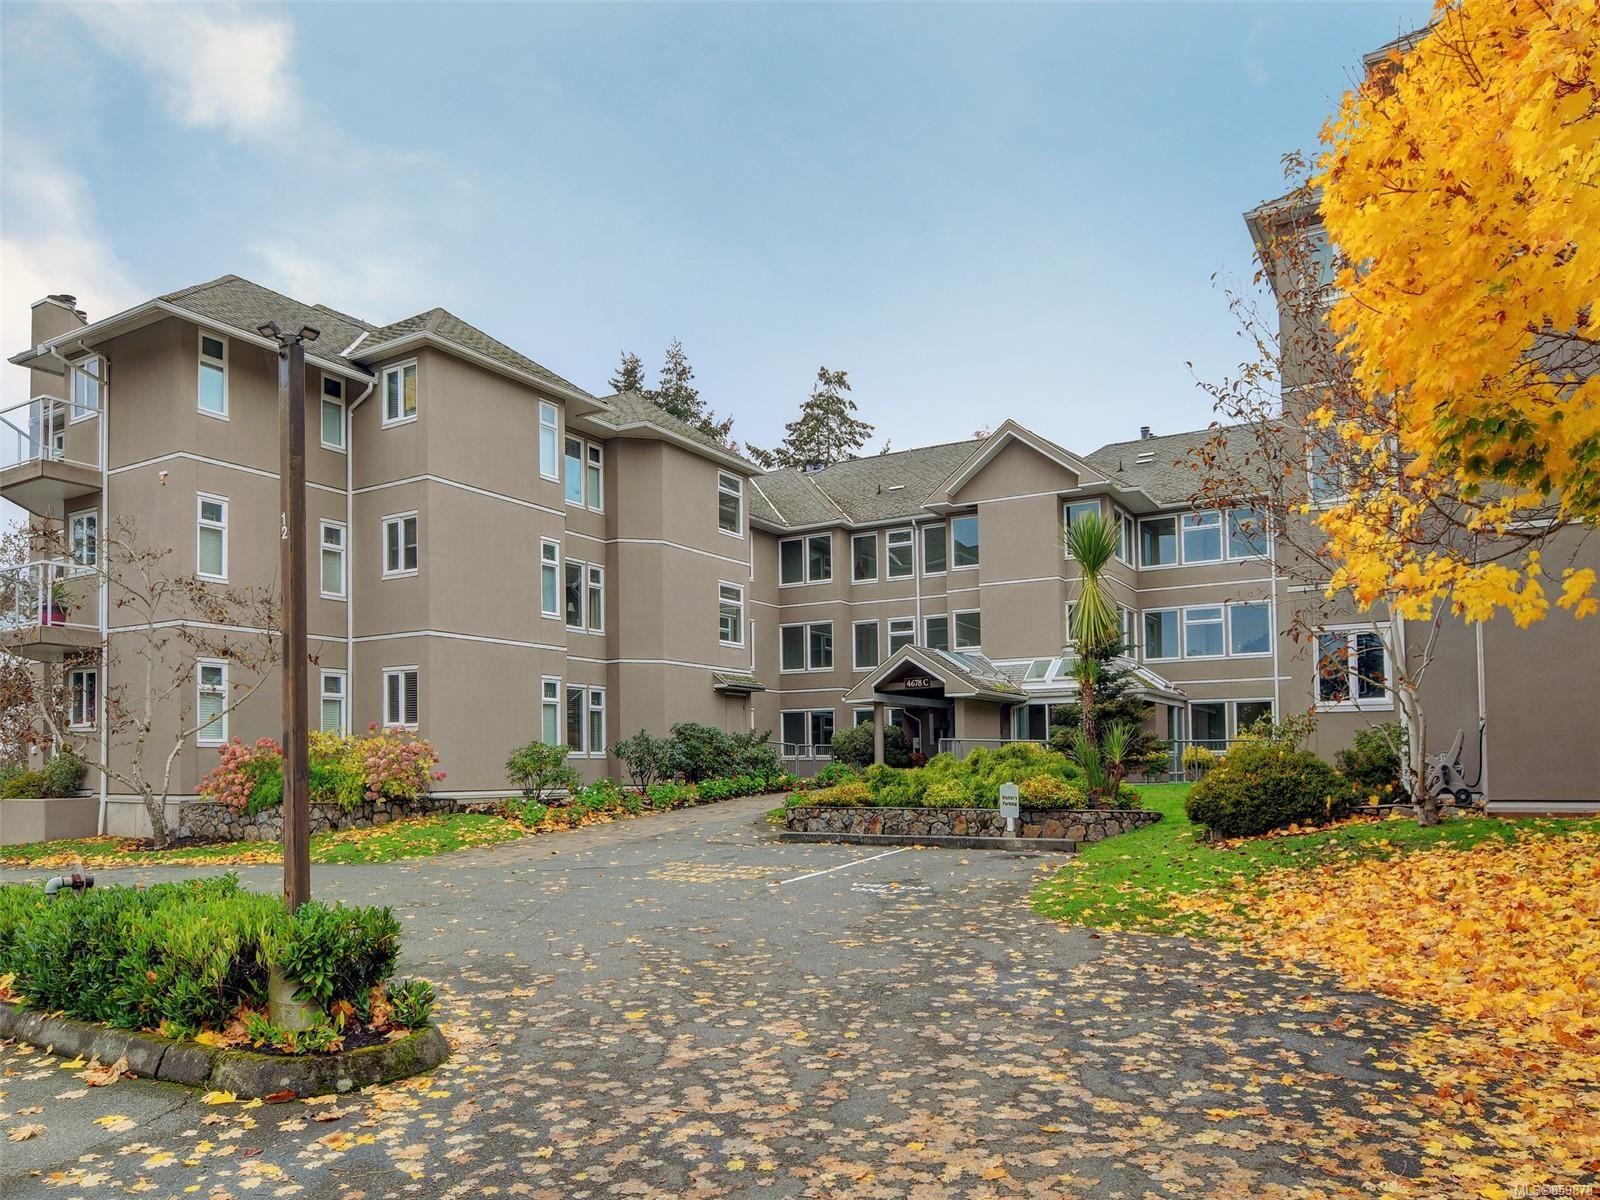 Main Photo: 203C 4678 Elk Lake Dr in : SW Royal Oak Condo for sale (Saanich West)  : MLS®# 859878